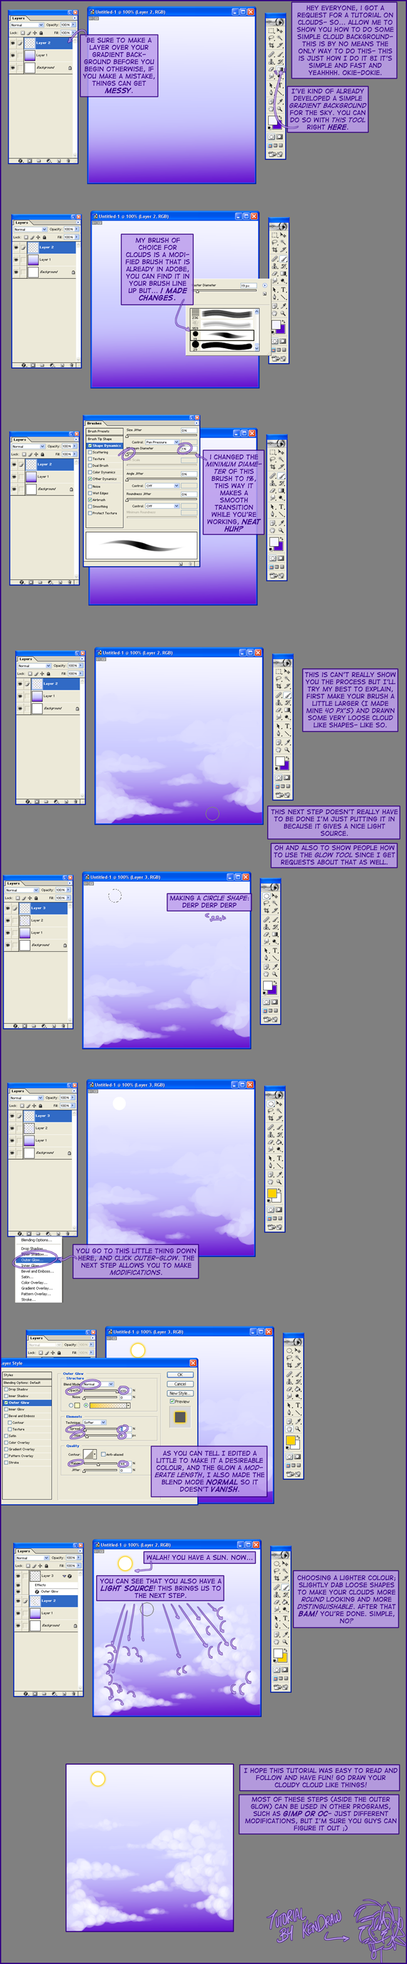 Cloud tutorial by cloudbabykc